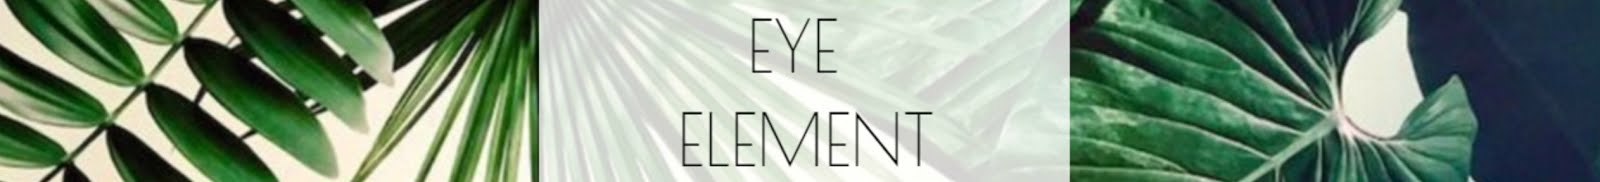 Eye Element